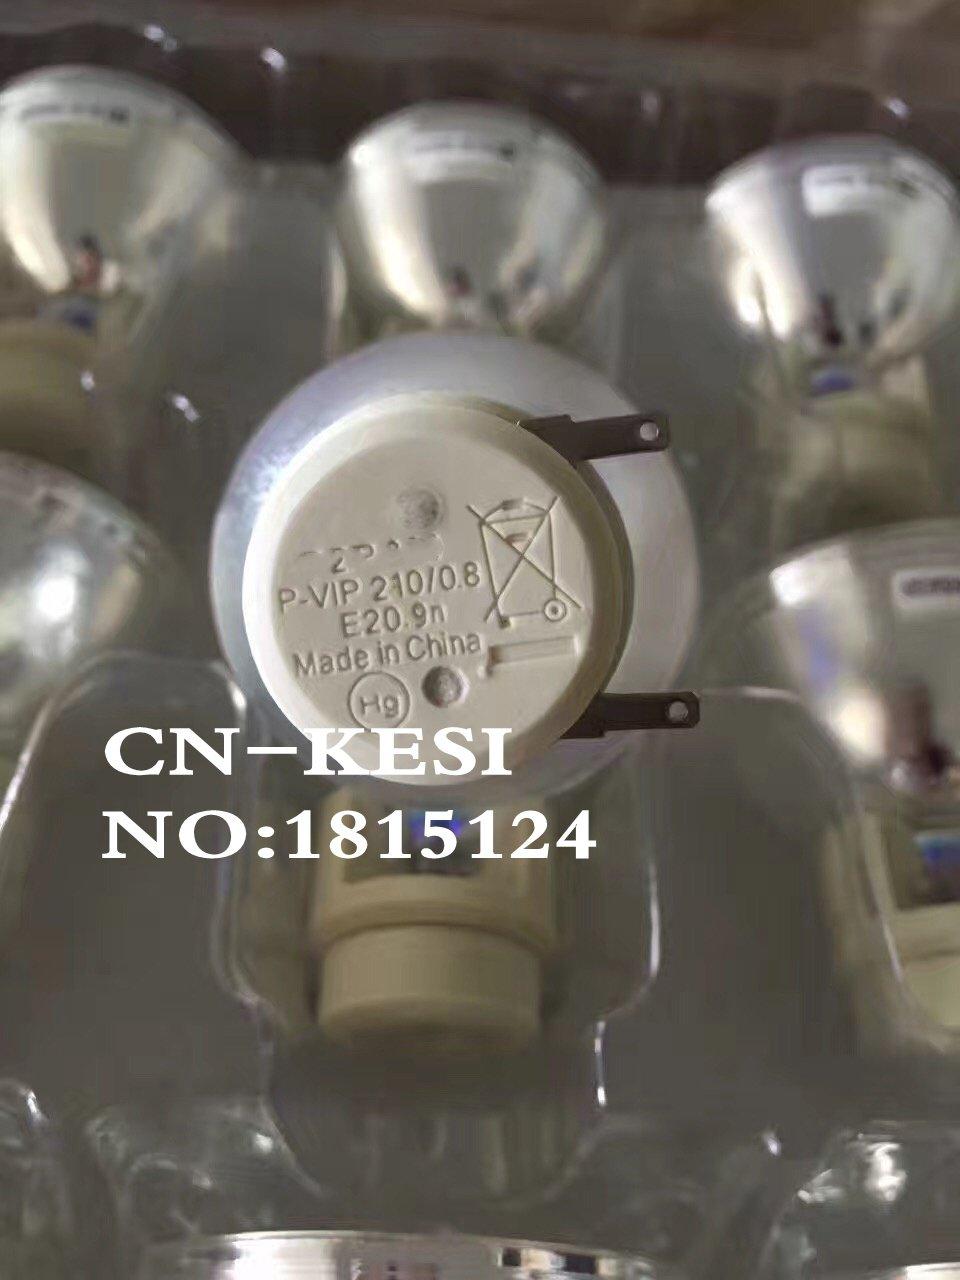 Здесь продается  CN-KESI P-VIP 210/0.8 E20.9N Original Projector Bulb FIT For BenQ / Optoma / Mitsubishi / Viewsonic Projector  Бытовая электроника